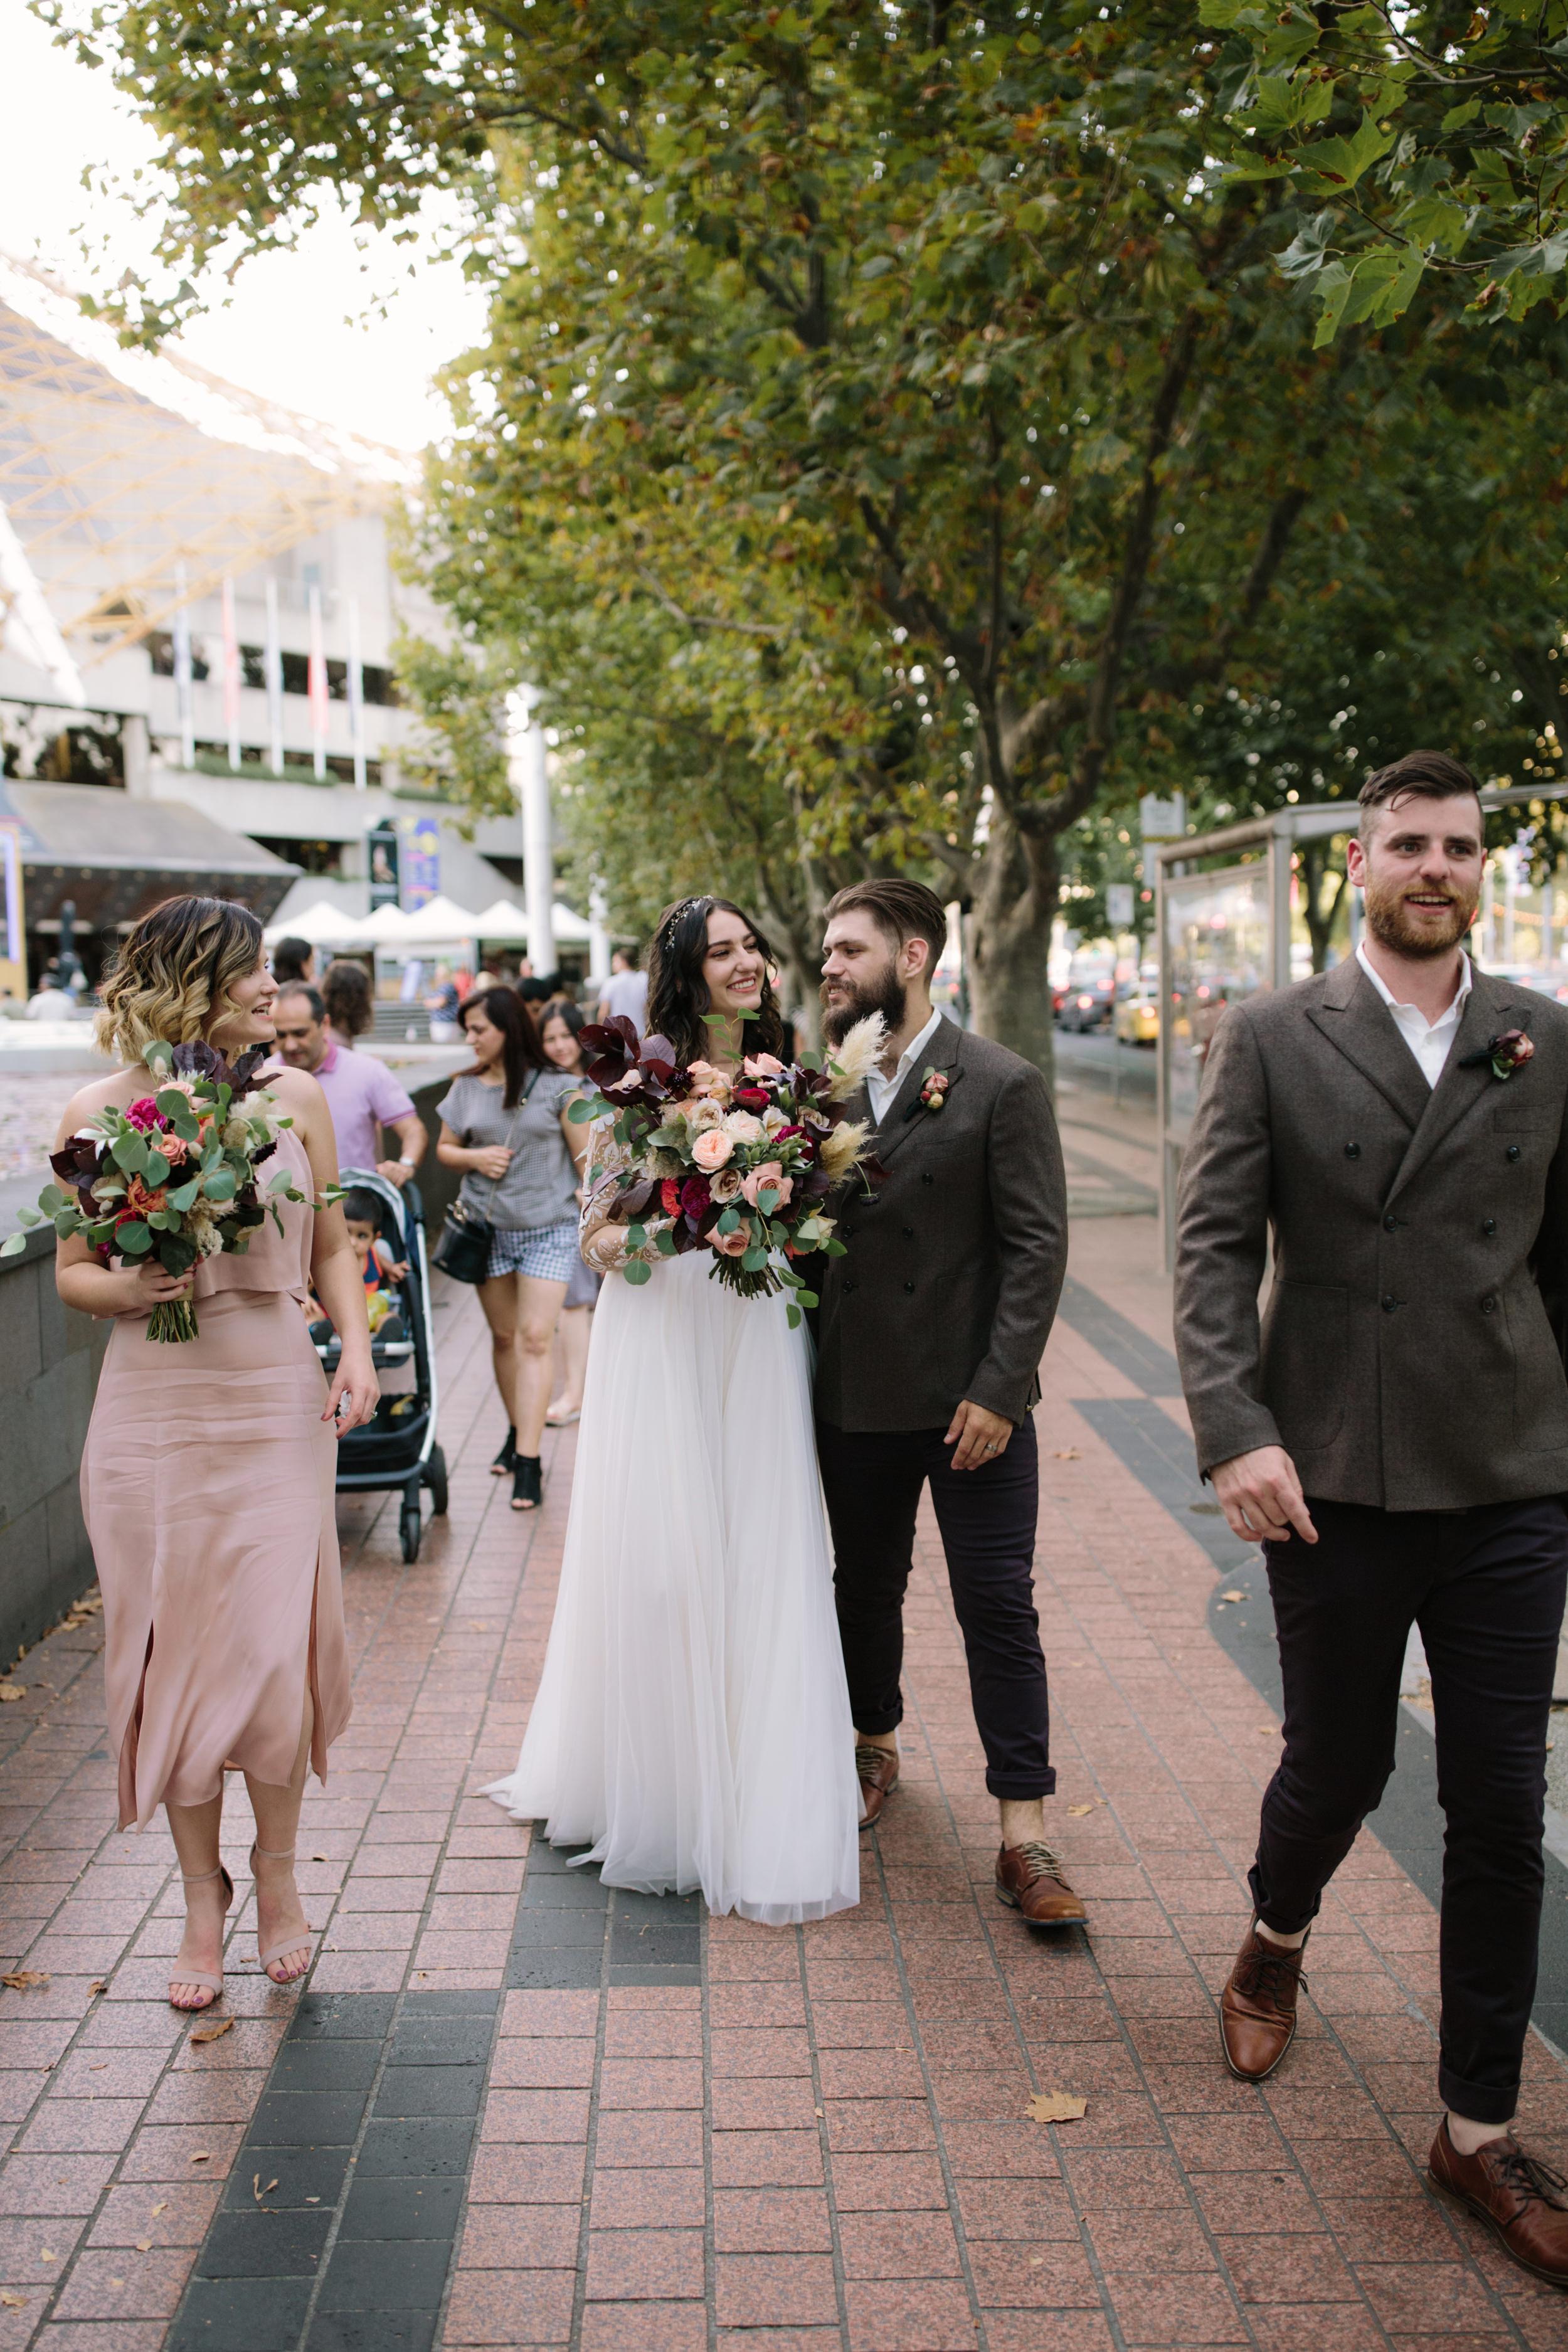 I-Got-You-Babe-Weddings-Hayley-Sam-NGV-Melbourne0085.JPG